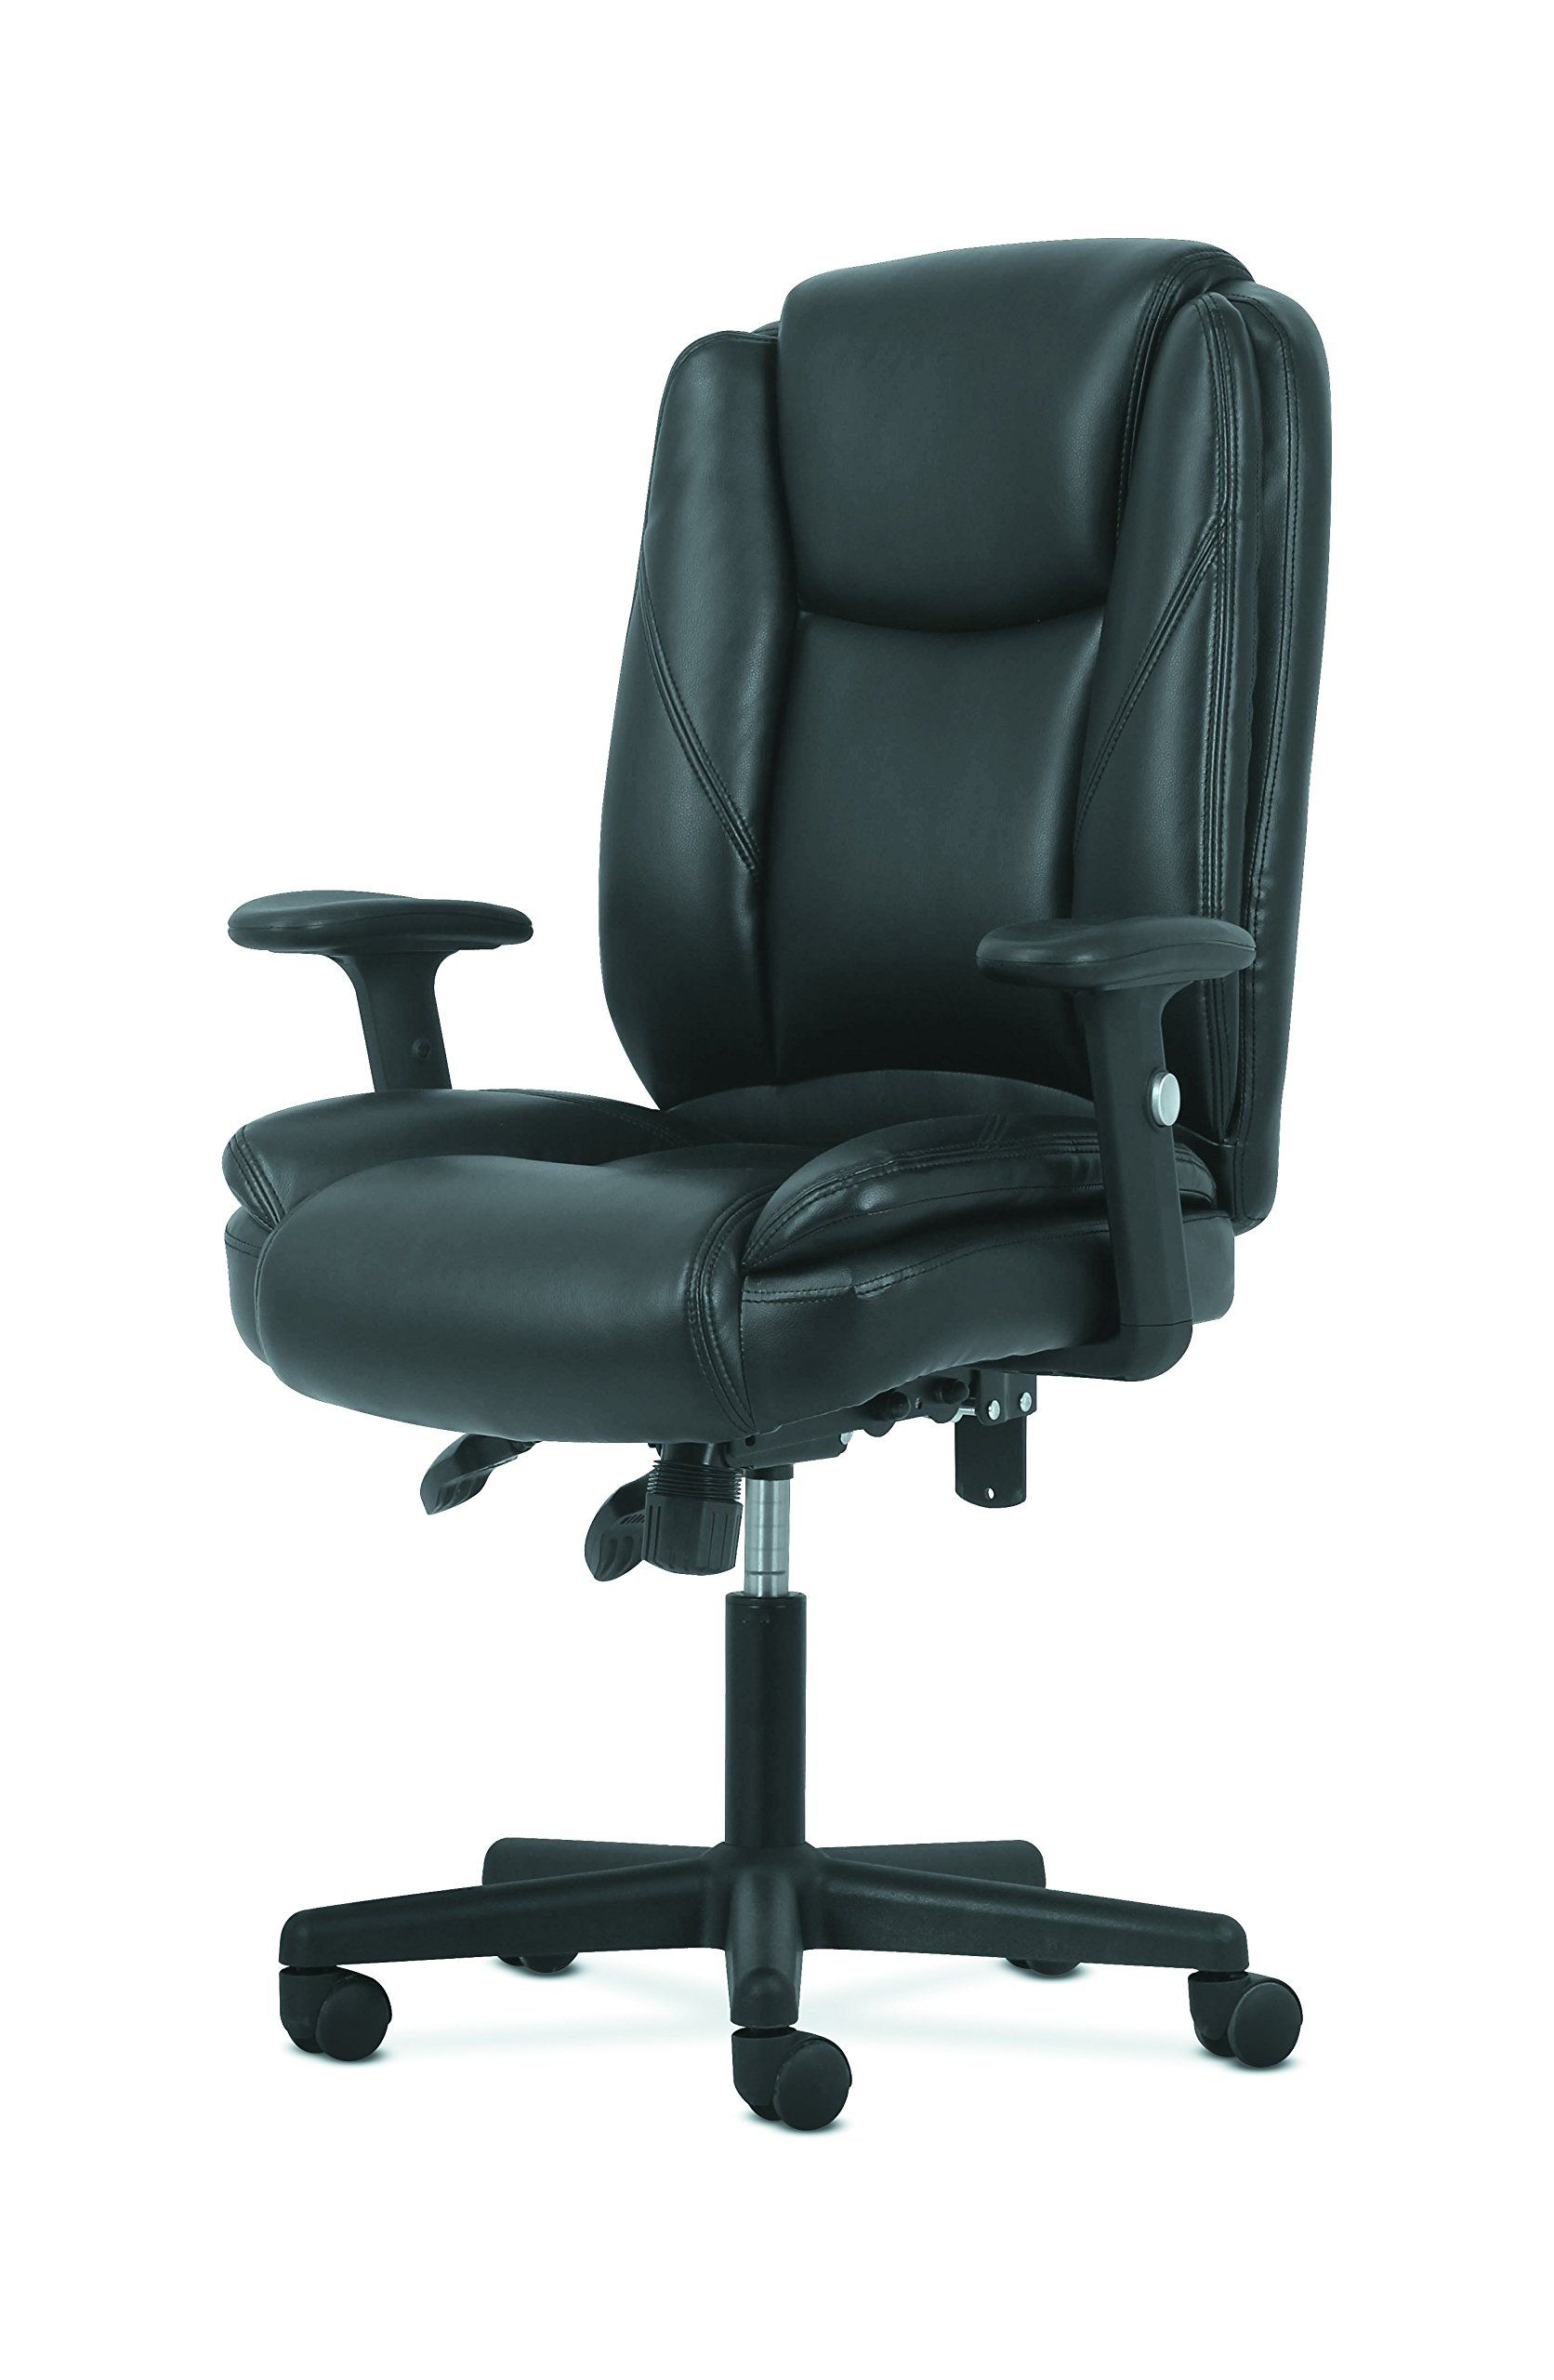 Hon sadie highback leather chair ergonomic